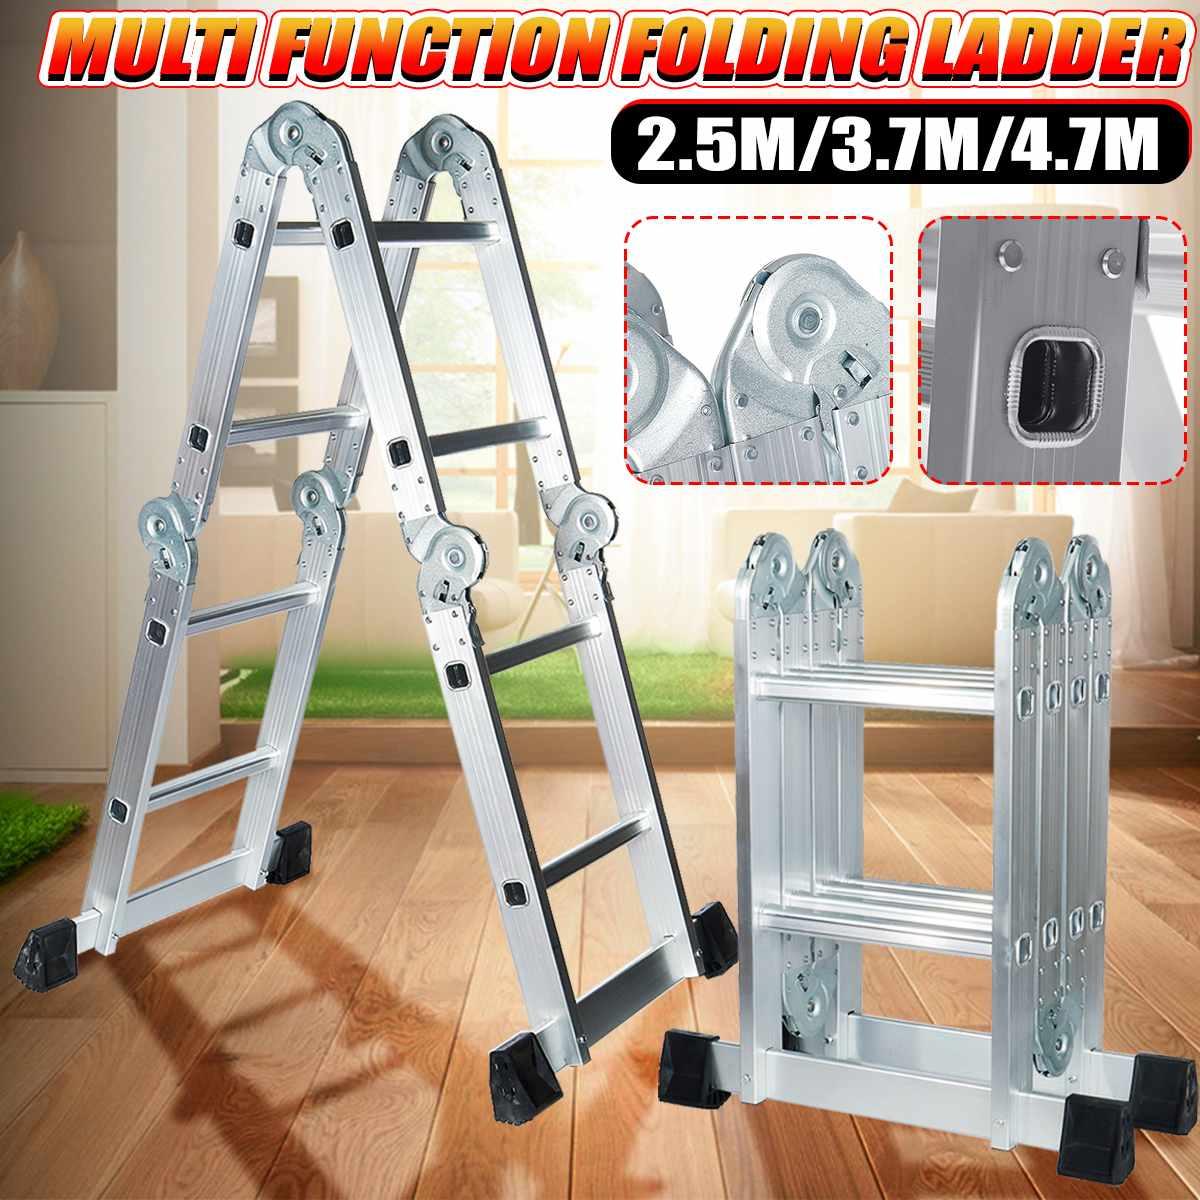 3.7m Telescopic Folding Ladder Step-Stand House Aluminium Ladders Telescoping Multi-Purpose Extension Folding Step Ladder